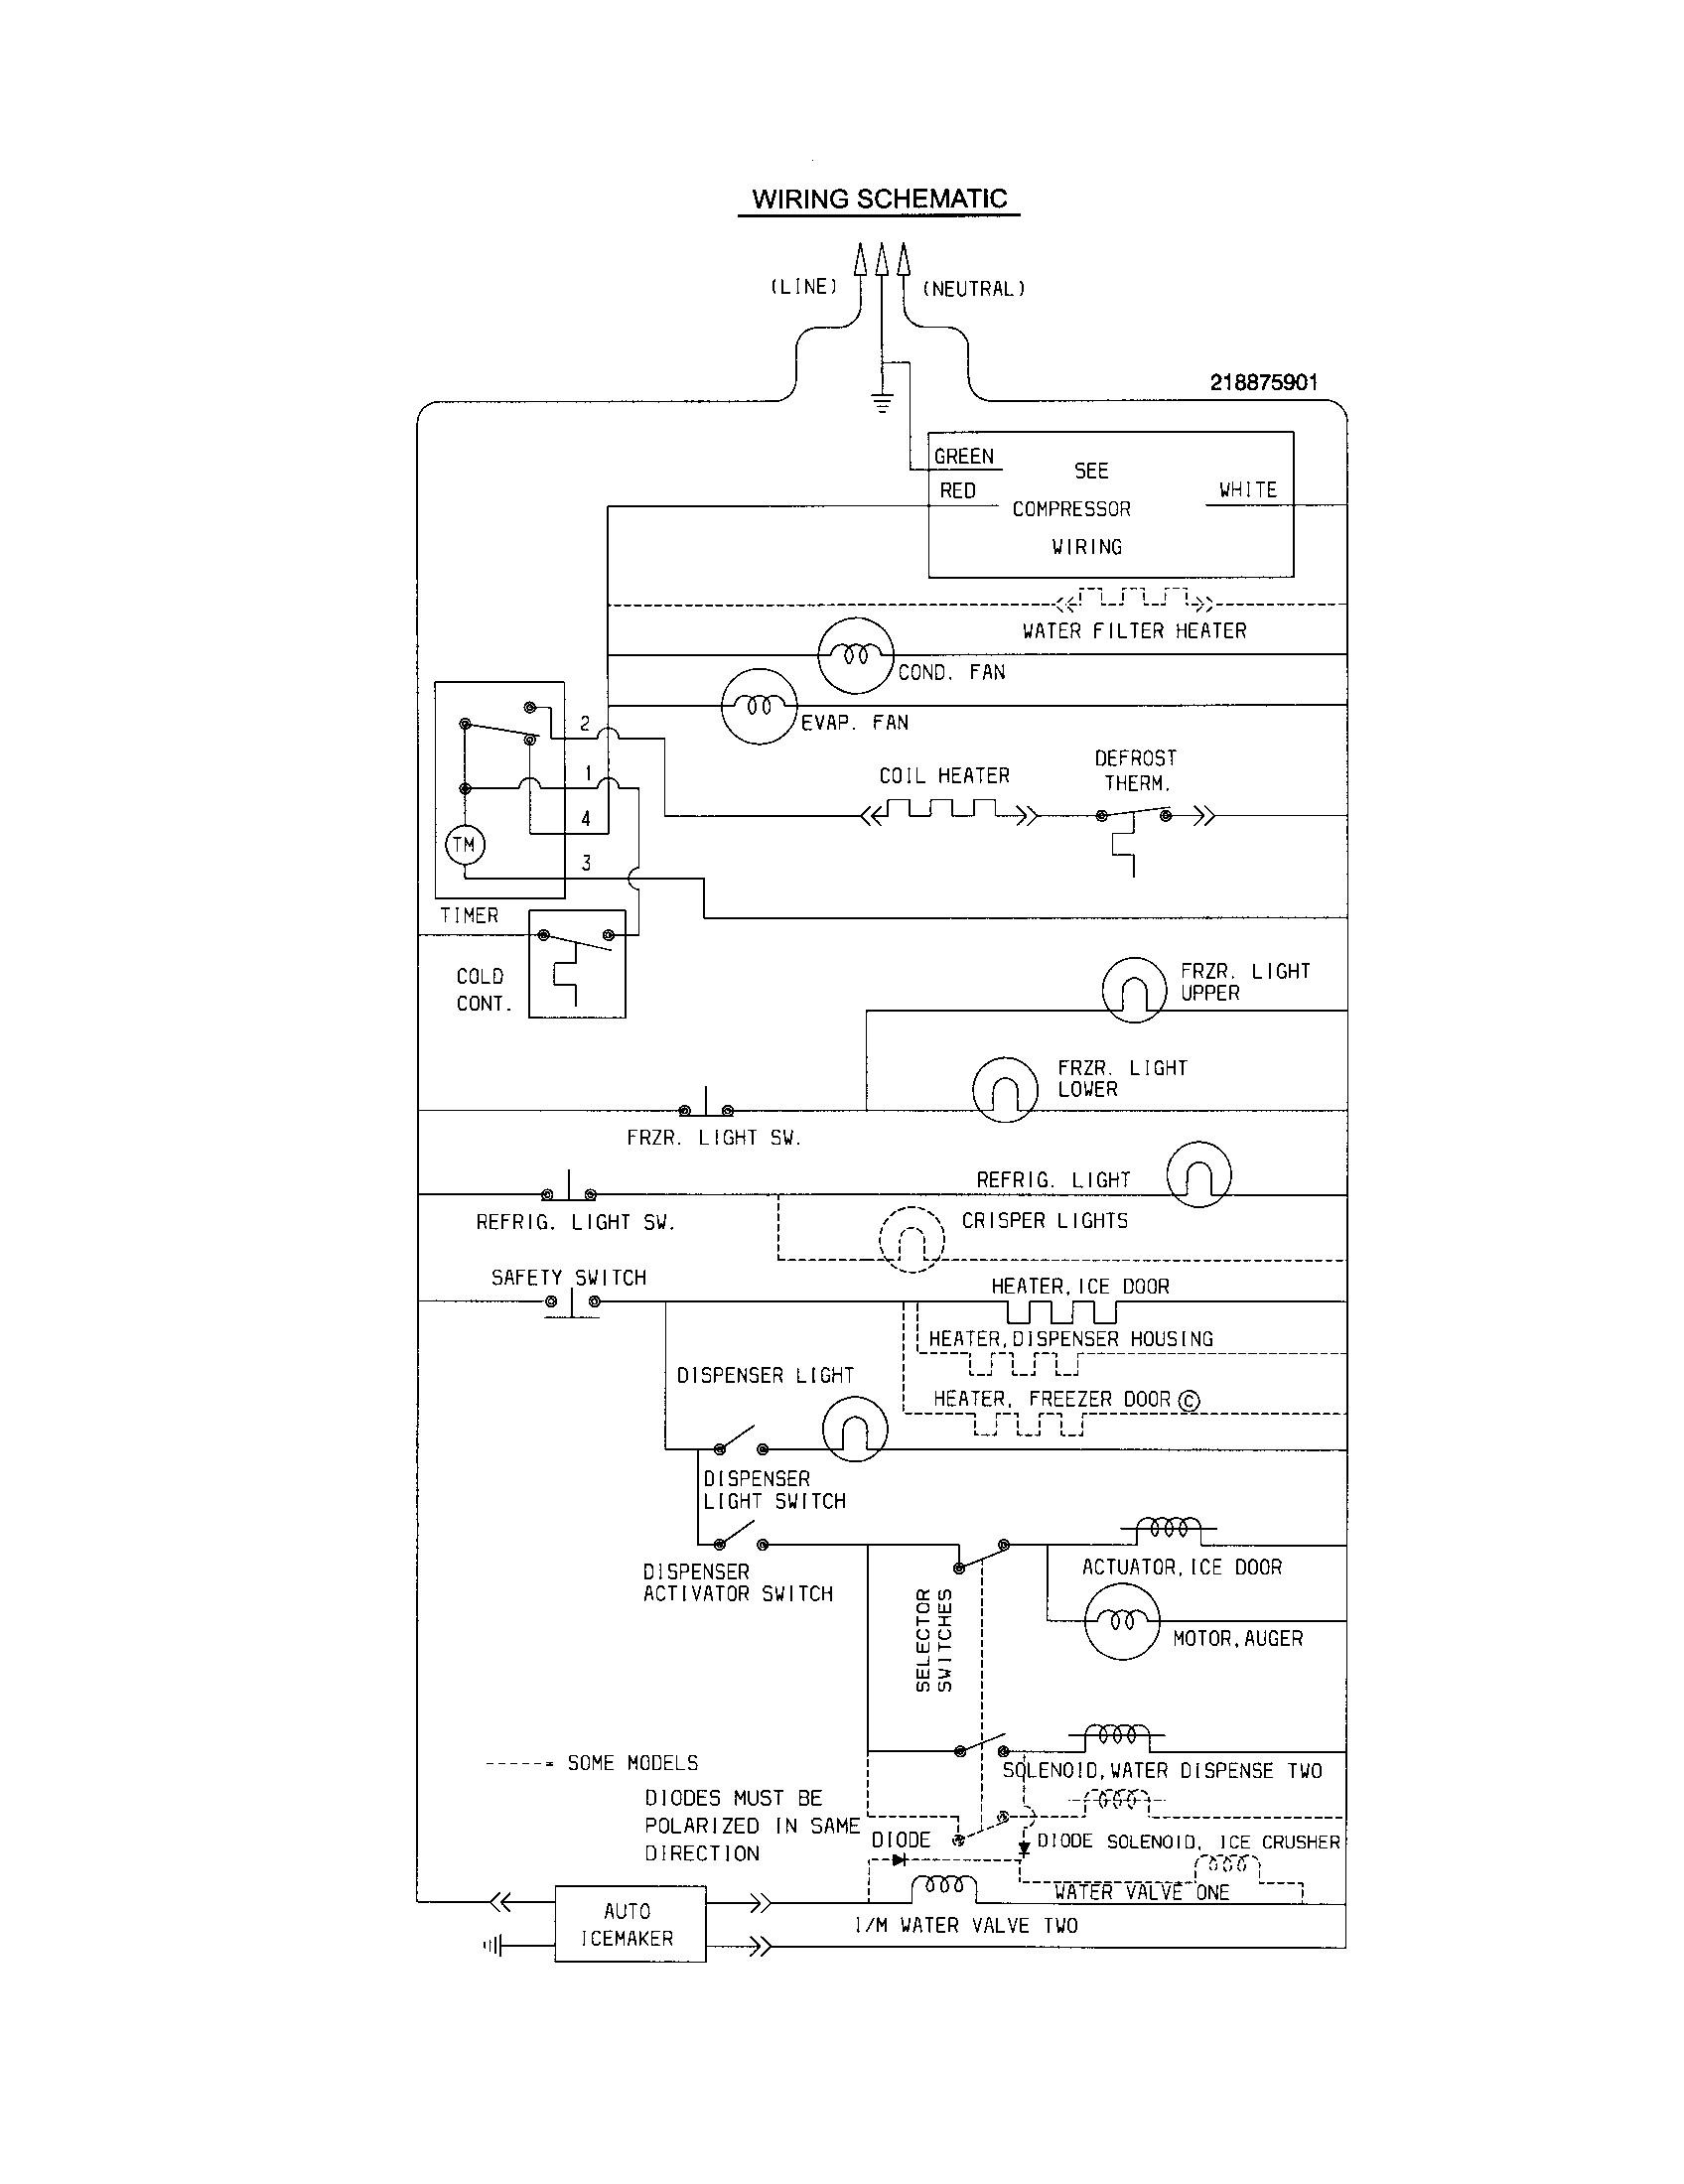 refrigerator wiring diagram besides frigidaire refrigerator wiring rh hashtravel co Frigidaire Dishwasher Wiring Frigidaire Dishwasher Wiring